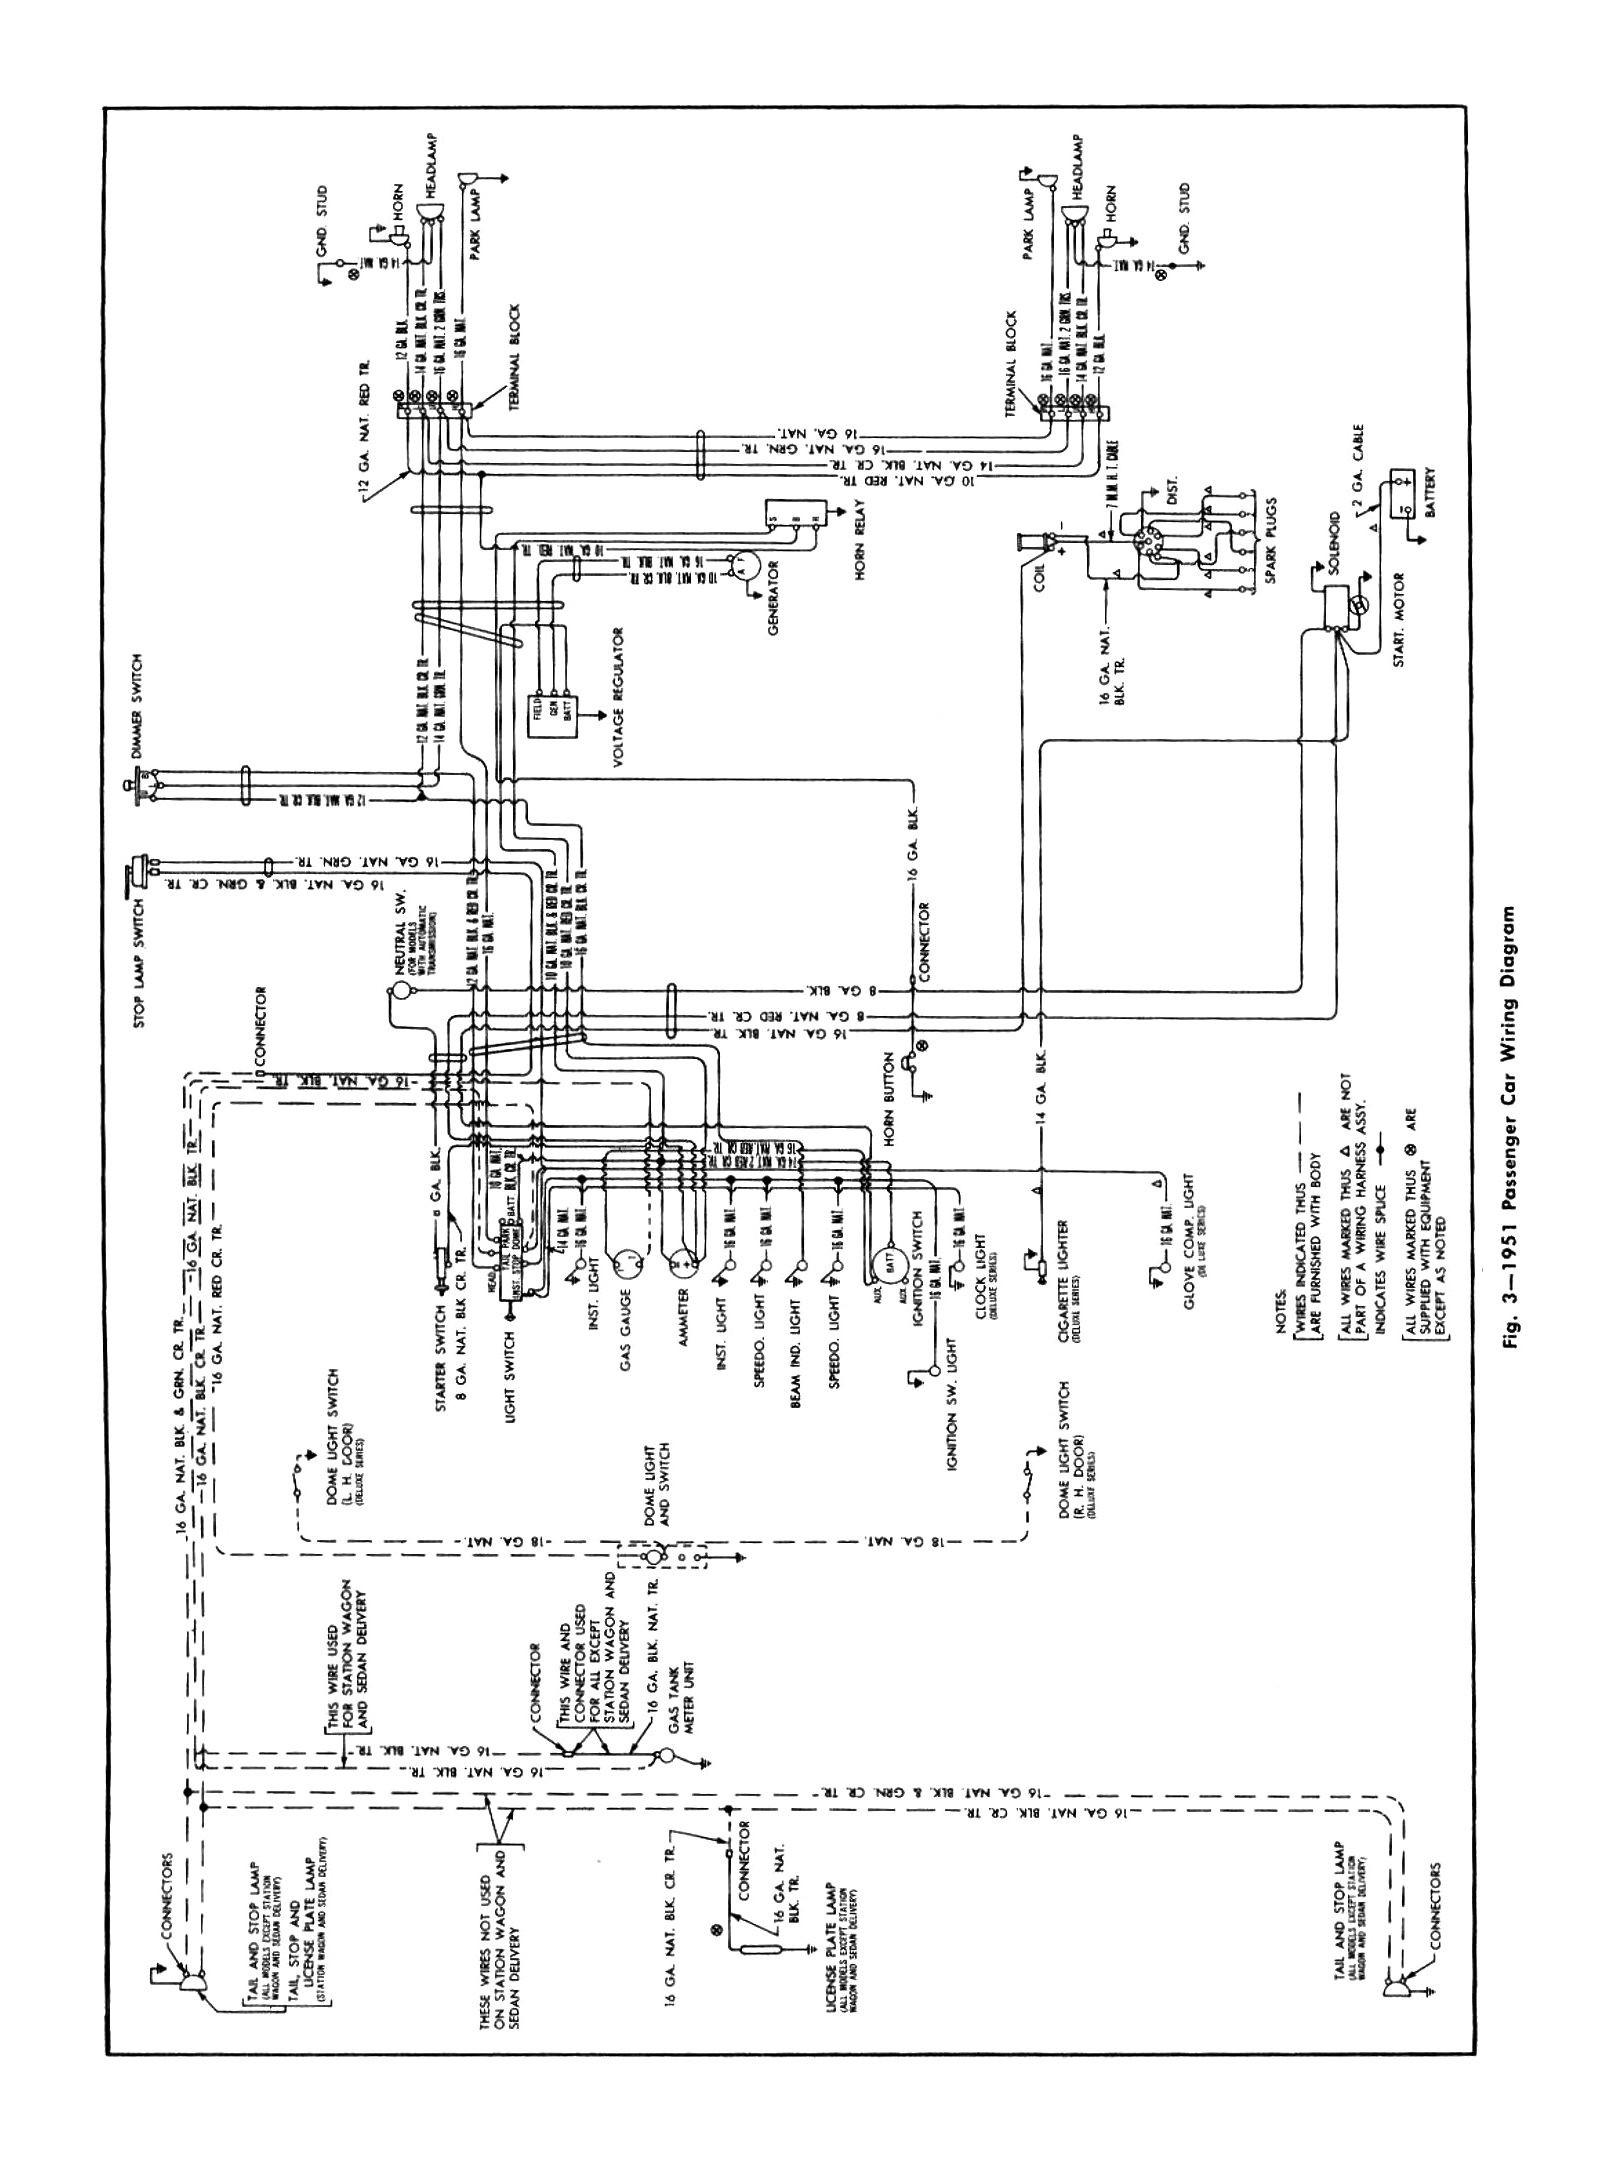 Wiring Diagram for A 1988 Club Car Chevy Wiring Diagrams Of Wiring Diagram for A 1988 Club Car